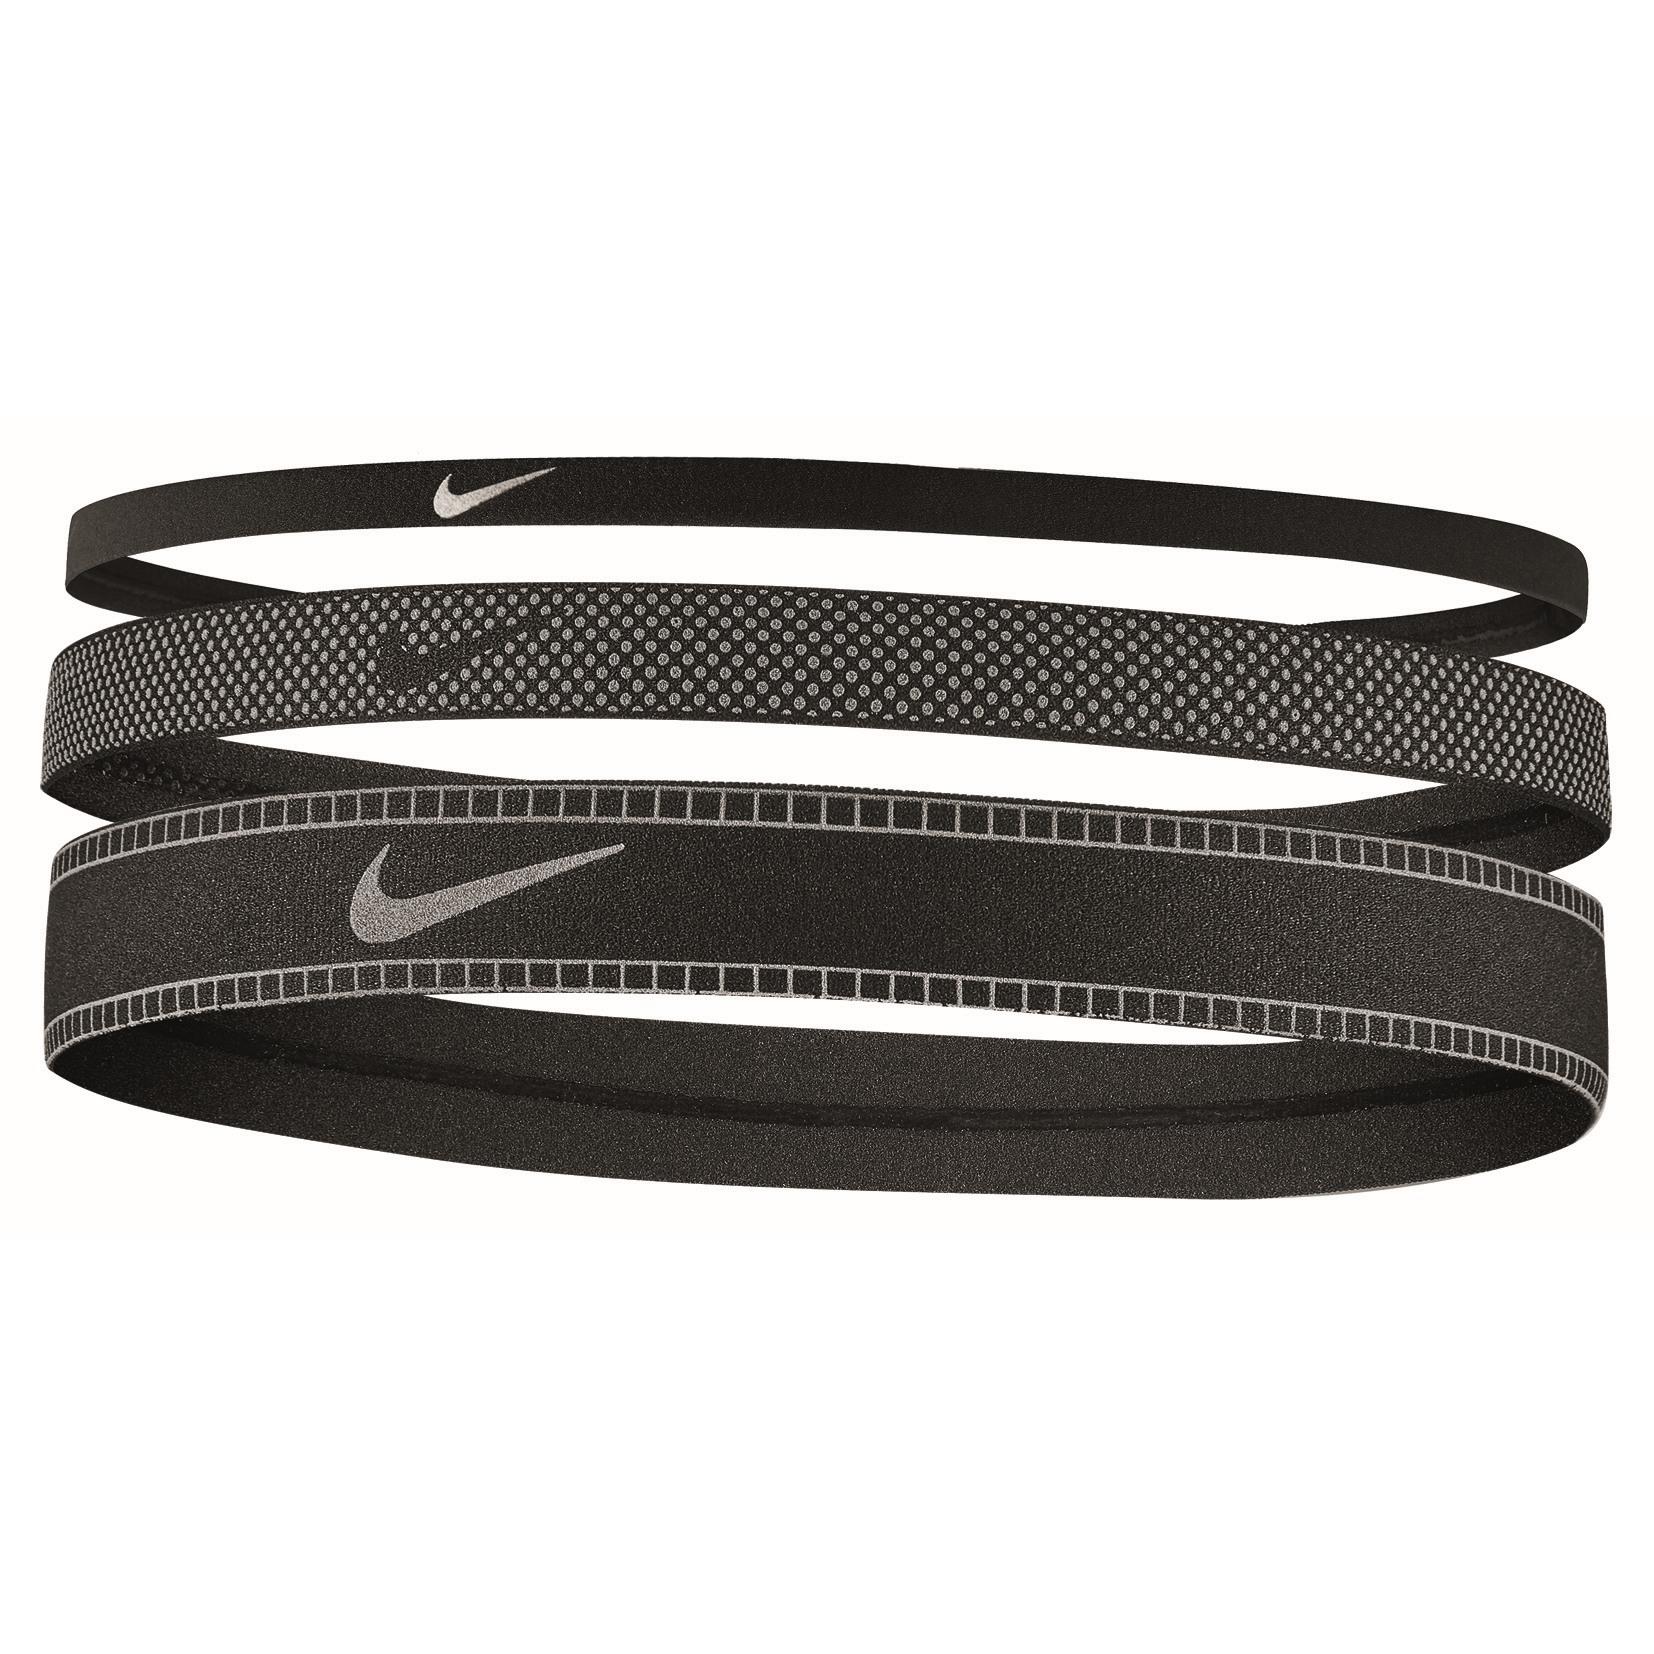 Nike Mixed Width Reflective Cinta del pelo - 3 Pares - black/silver/black 047